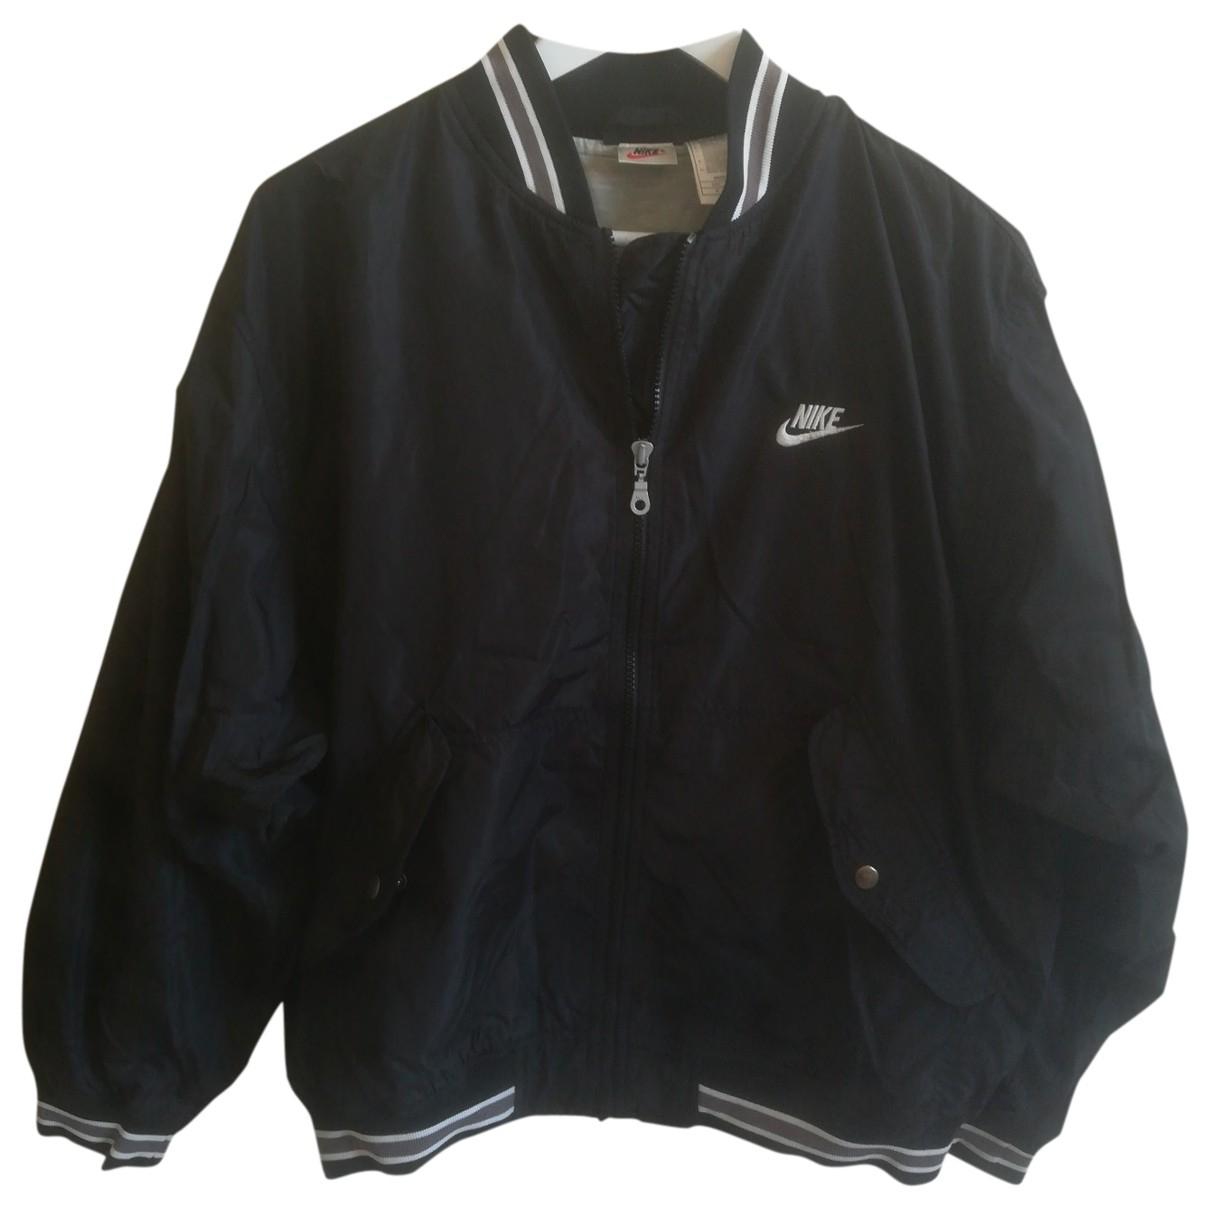 Nike \N Black Cotton jacket for Women M International